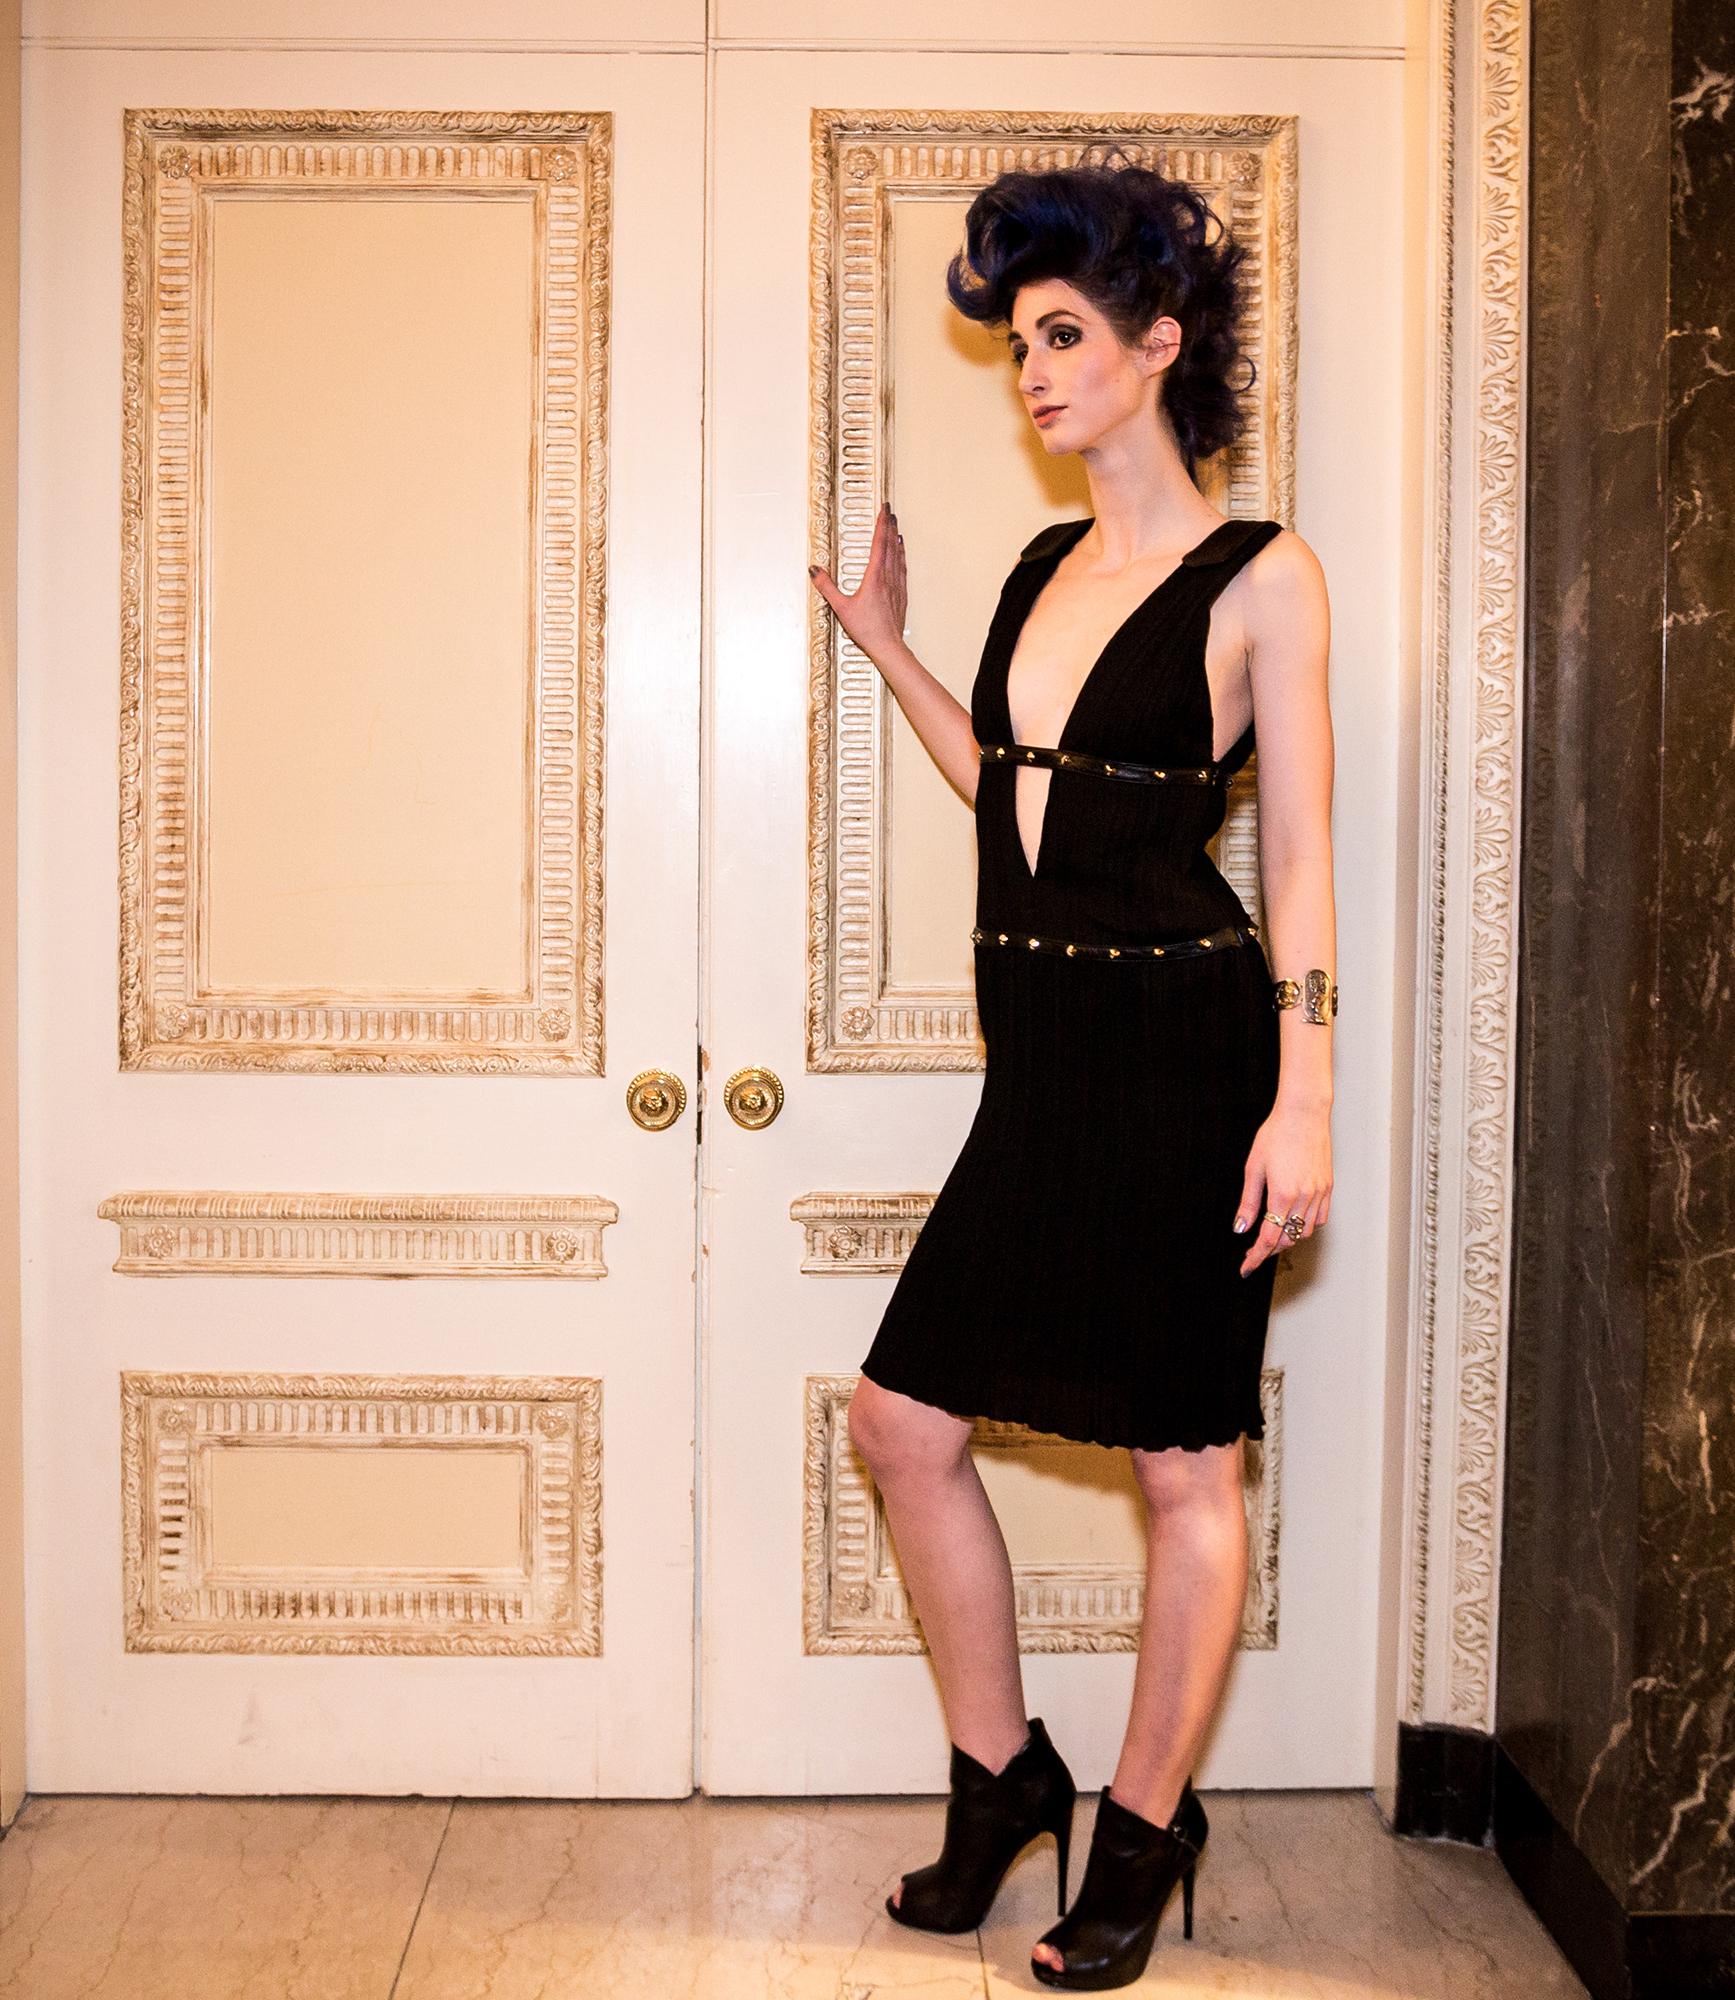 Geena Matuson (@geenamatuson) photographed by CDA Media.